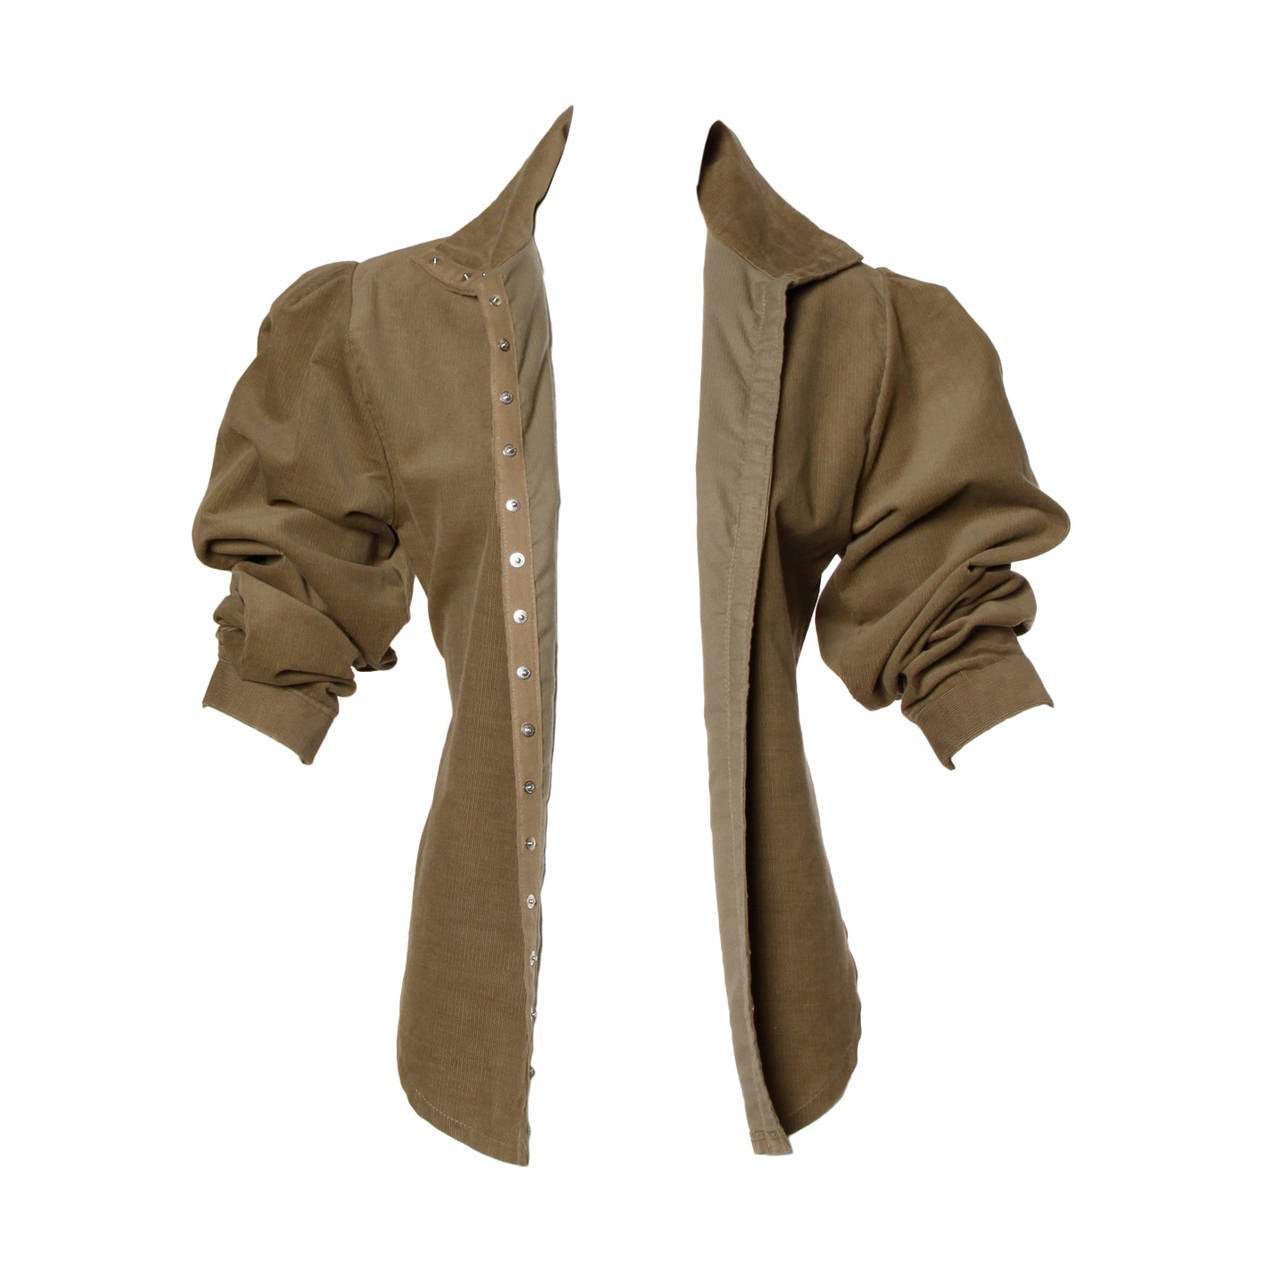 Norma Kamali Vintage Avant Garde Top or Jacket